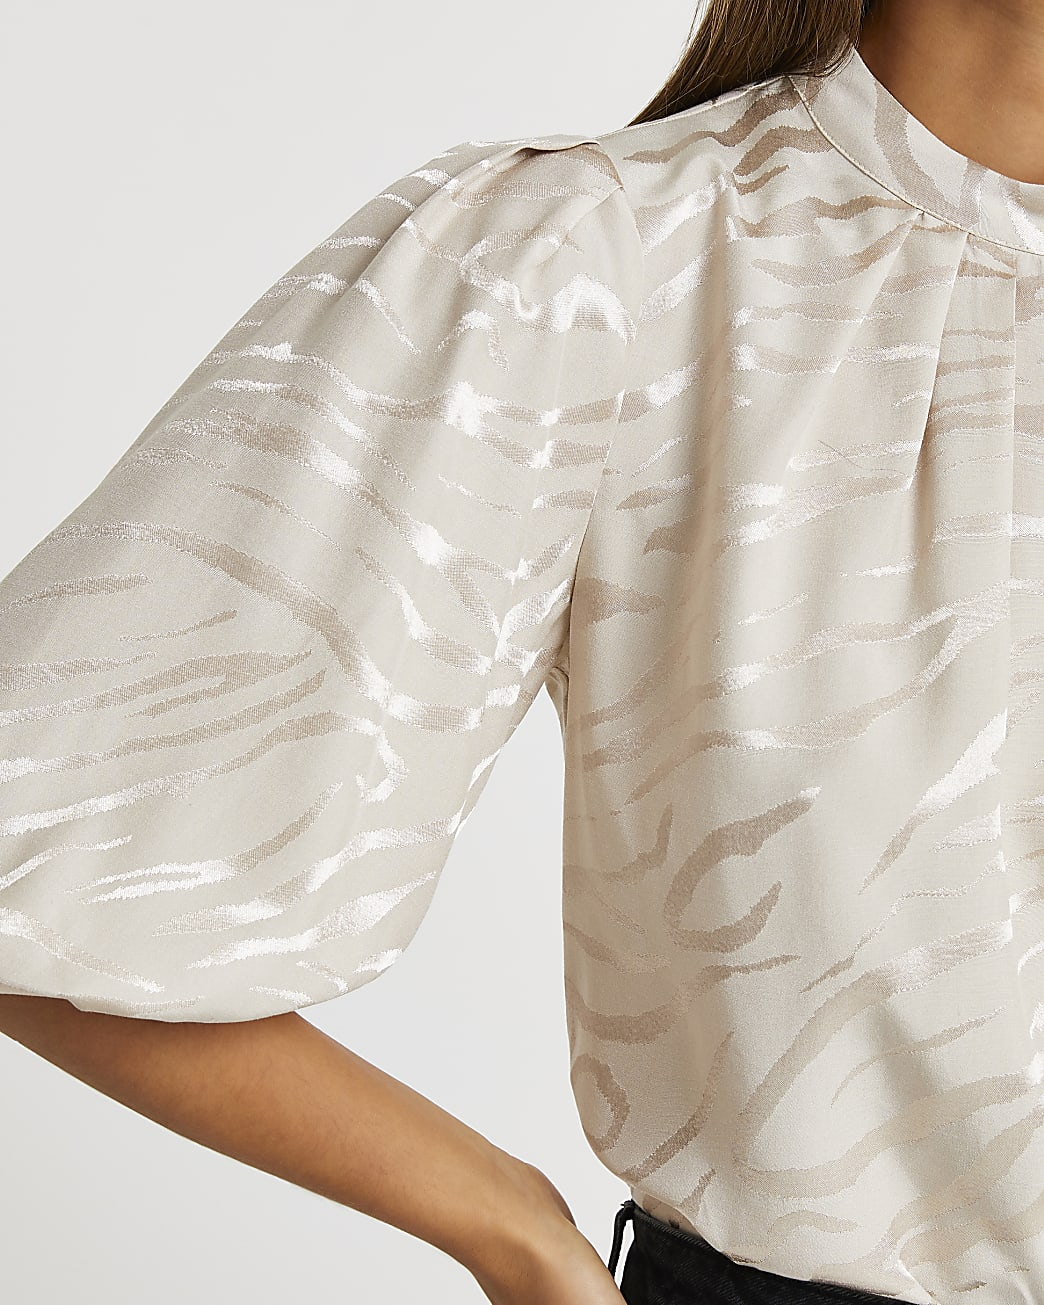 Stone high neck animal print blouse top